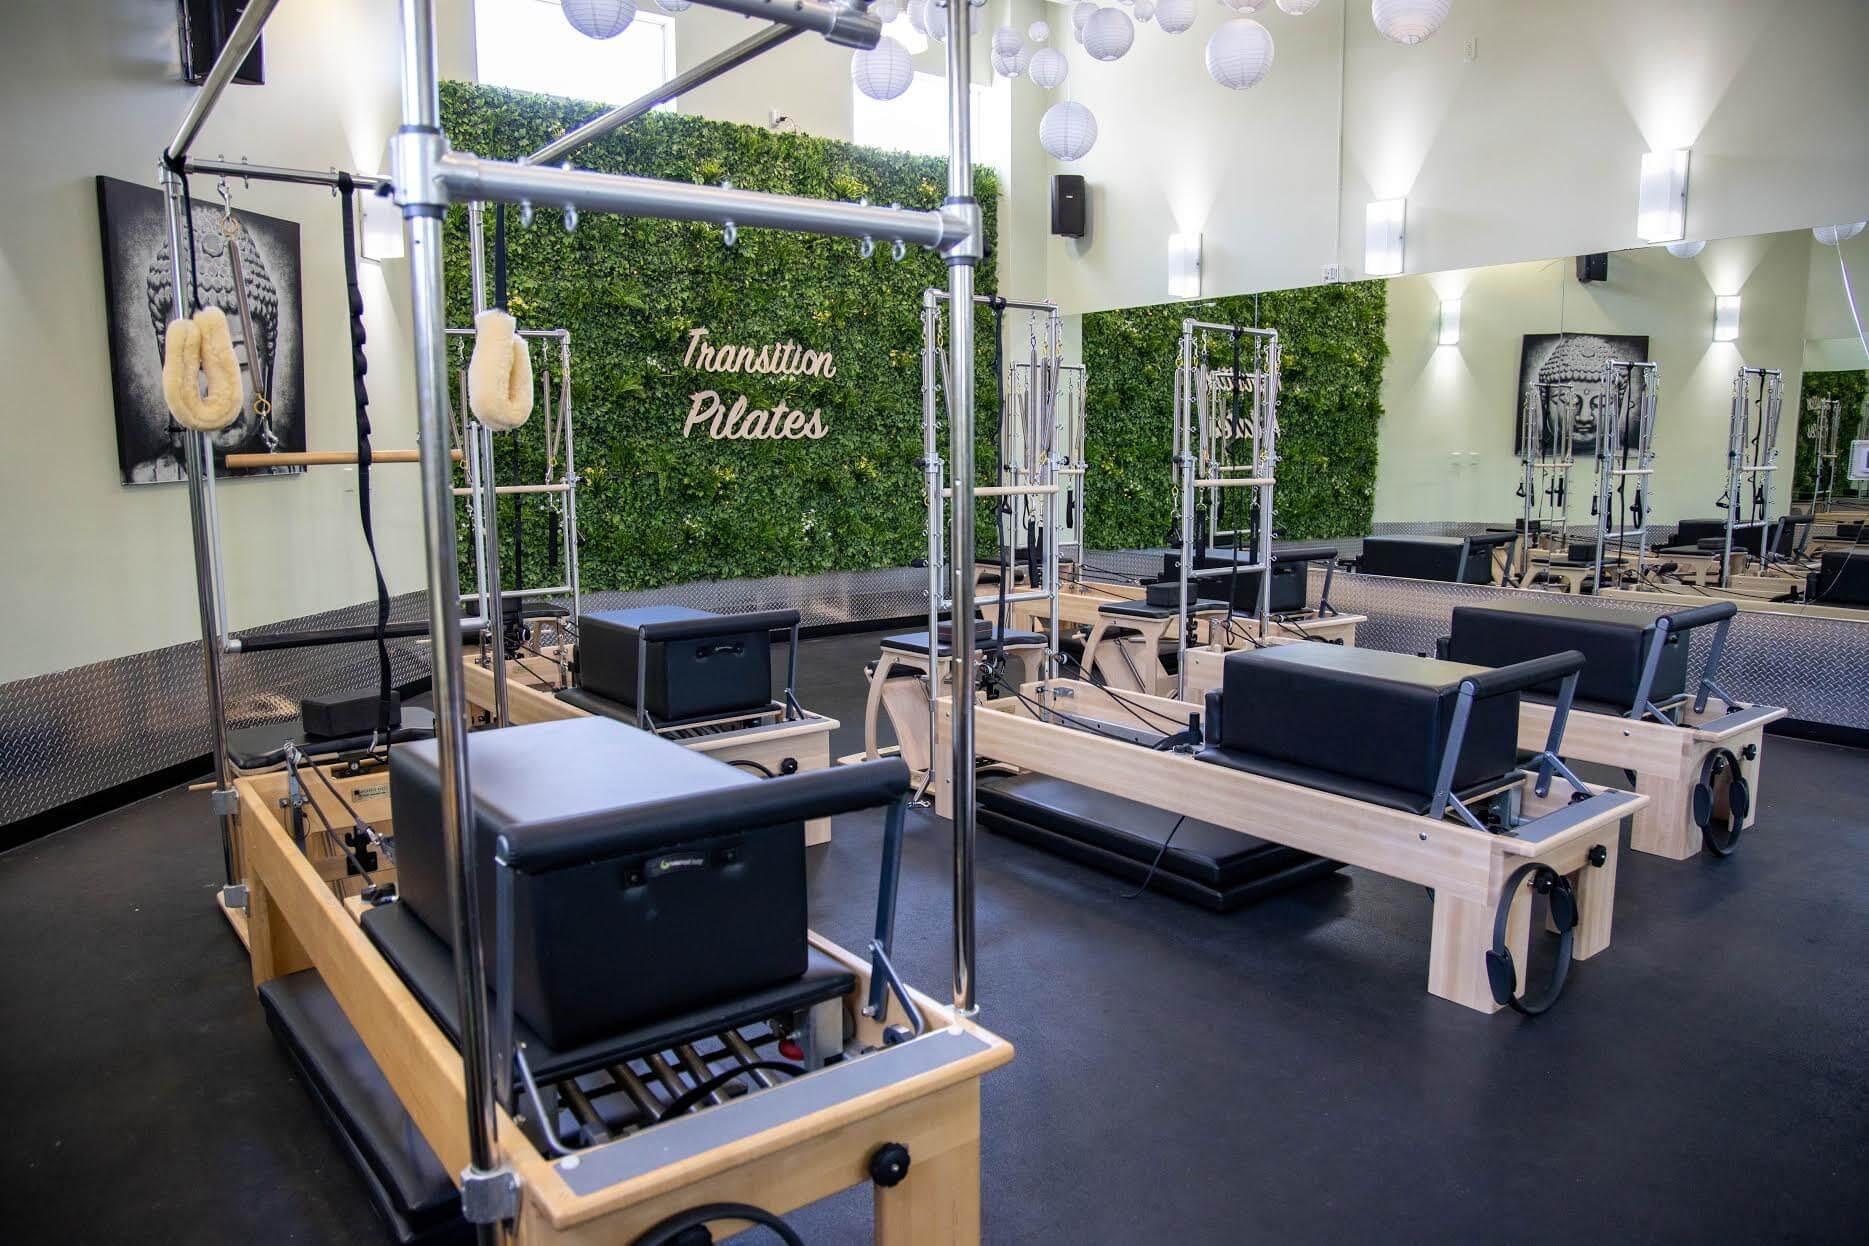 Transition Pilates